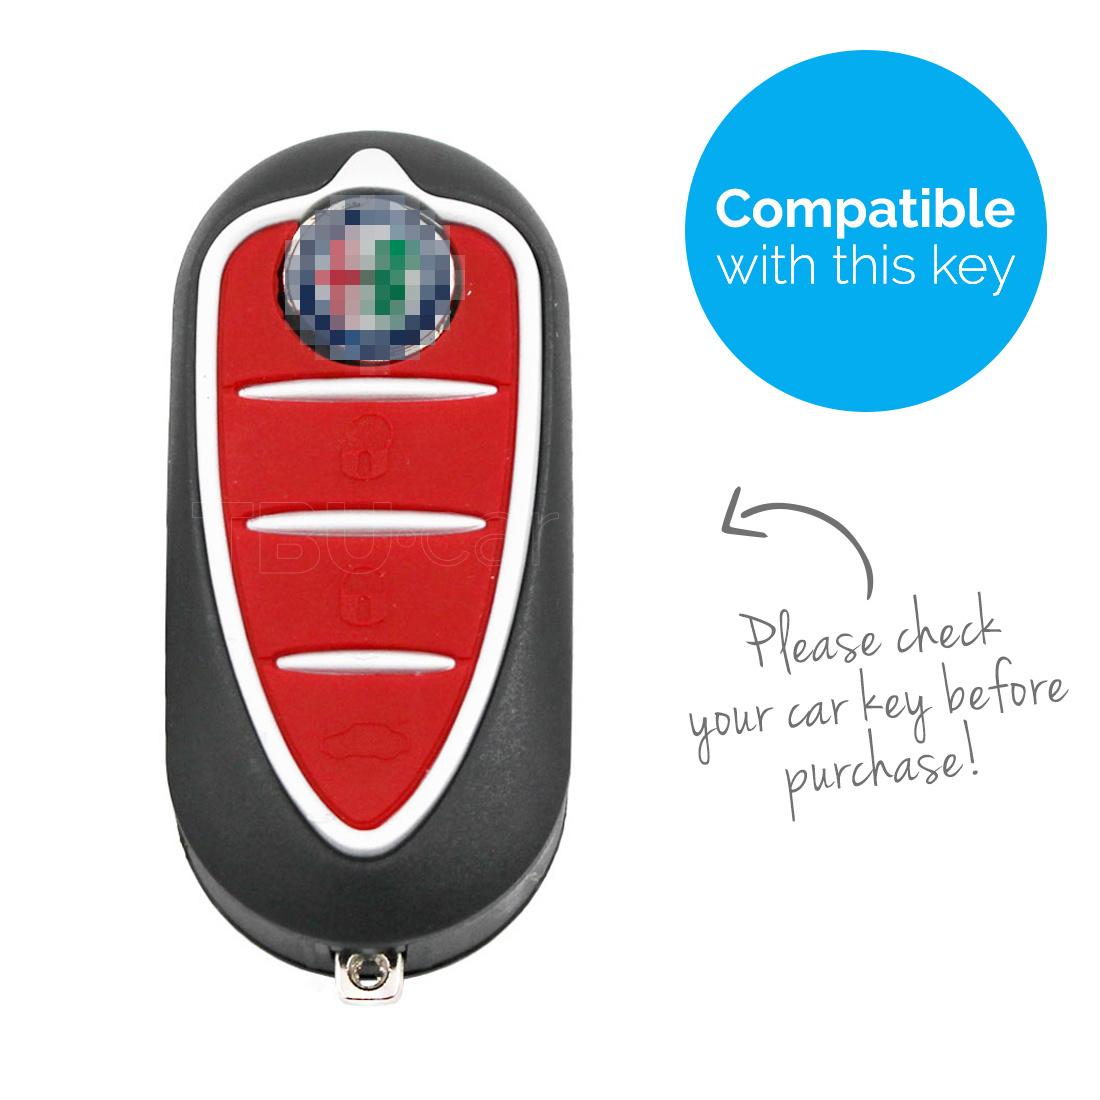 TBU car TBU car Sleutel cover compatibel met Alfa Romeo - Silicone sleutelhoesje - beschermhoesje autosleutel - Glow in the Dark